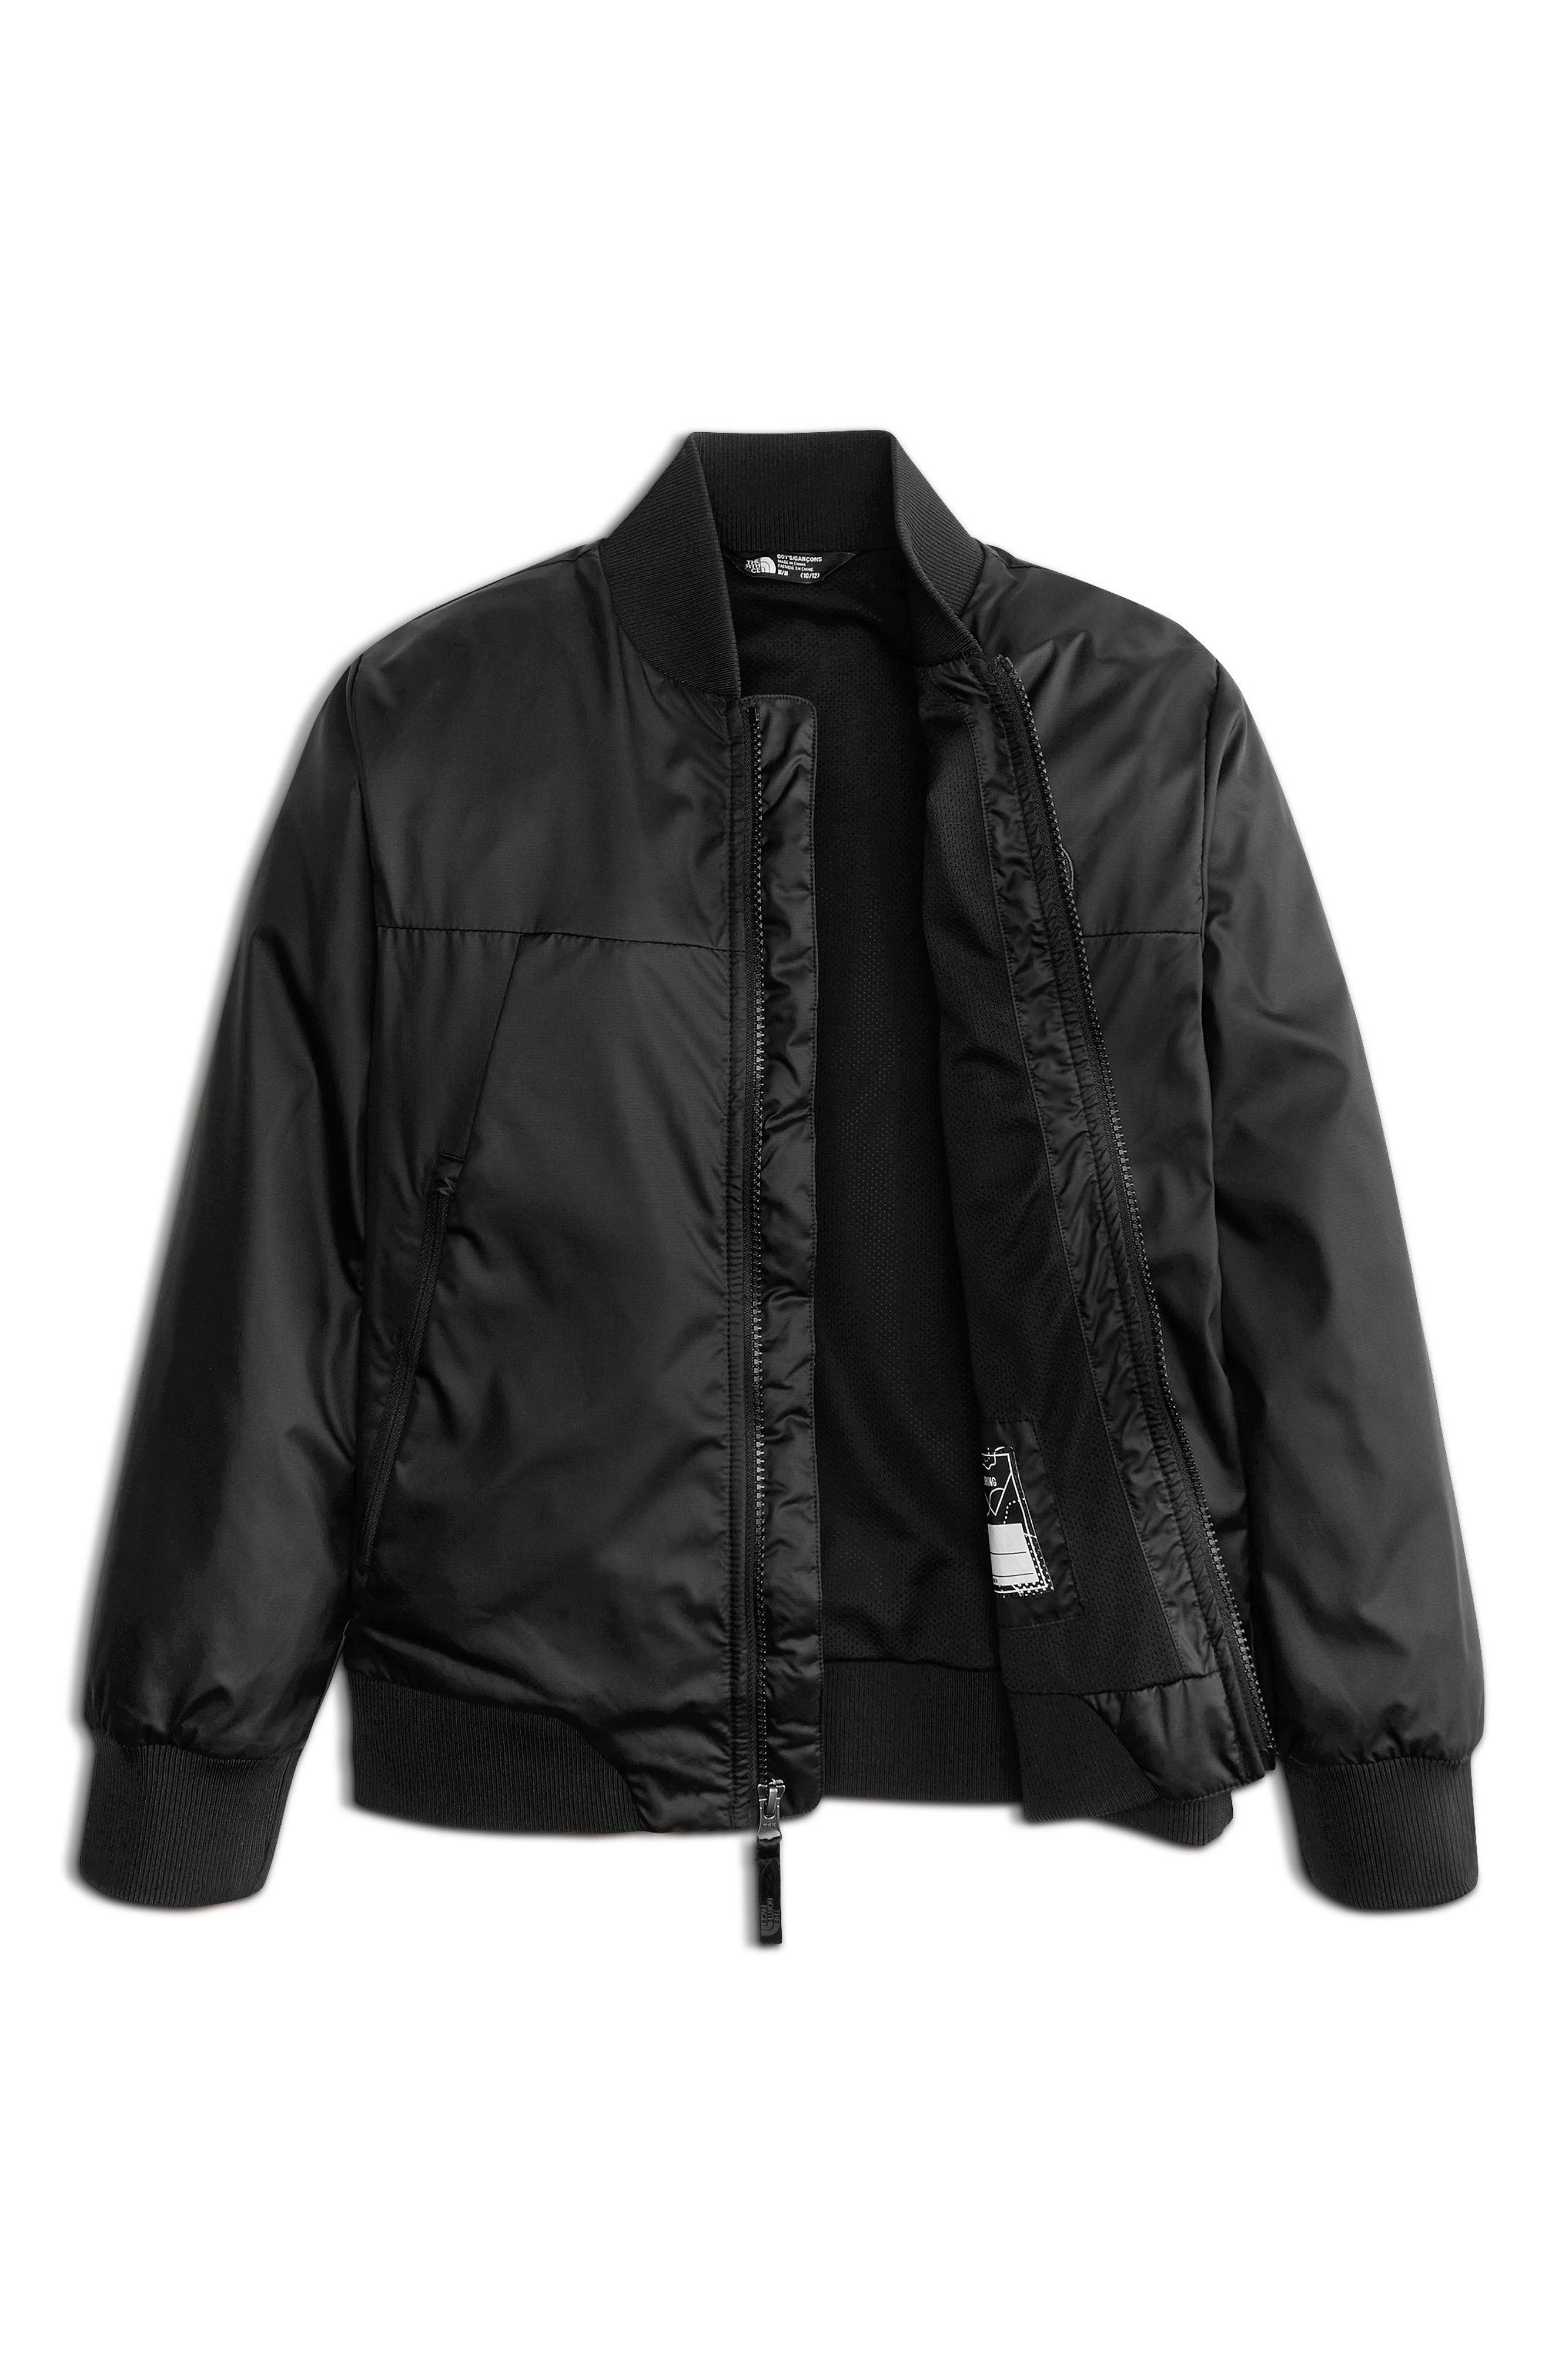 Flurry Windproof Bomber Jacket,                             Alternate thumbnail 3, color,                             Tnf Black